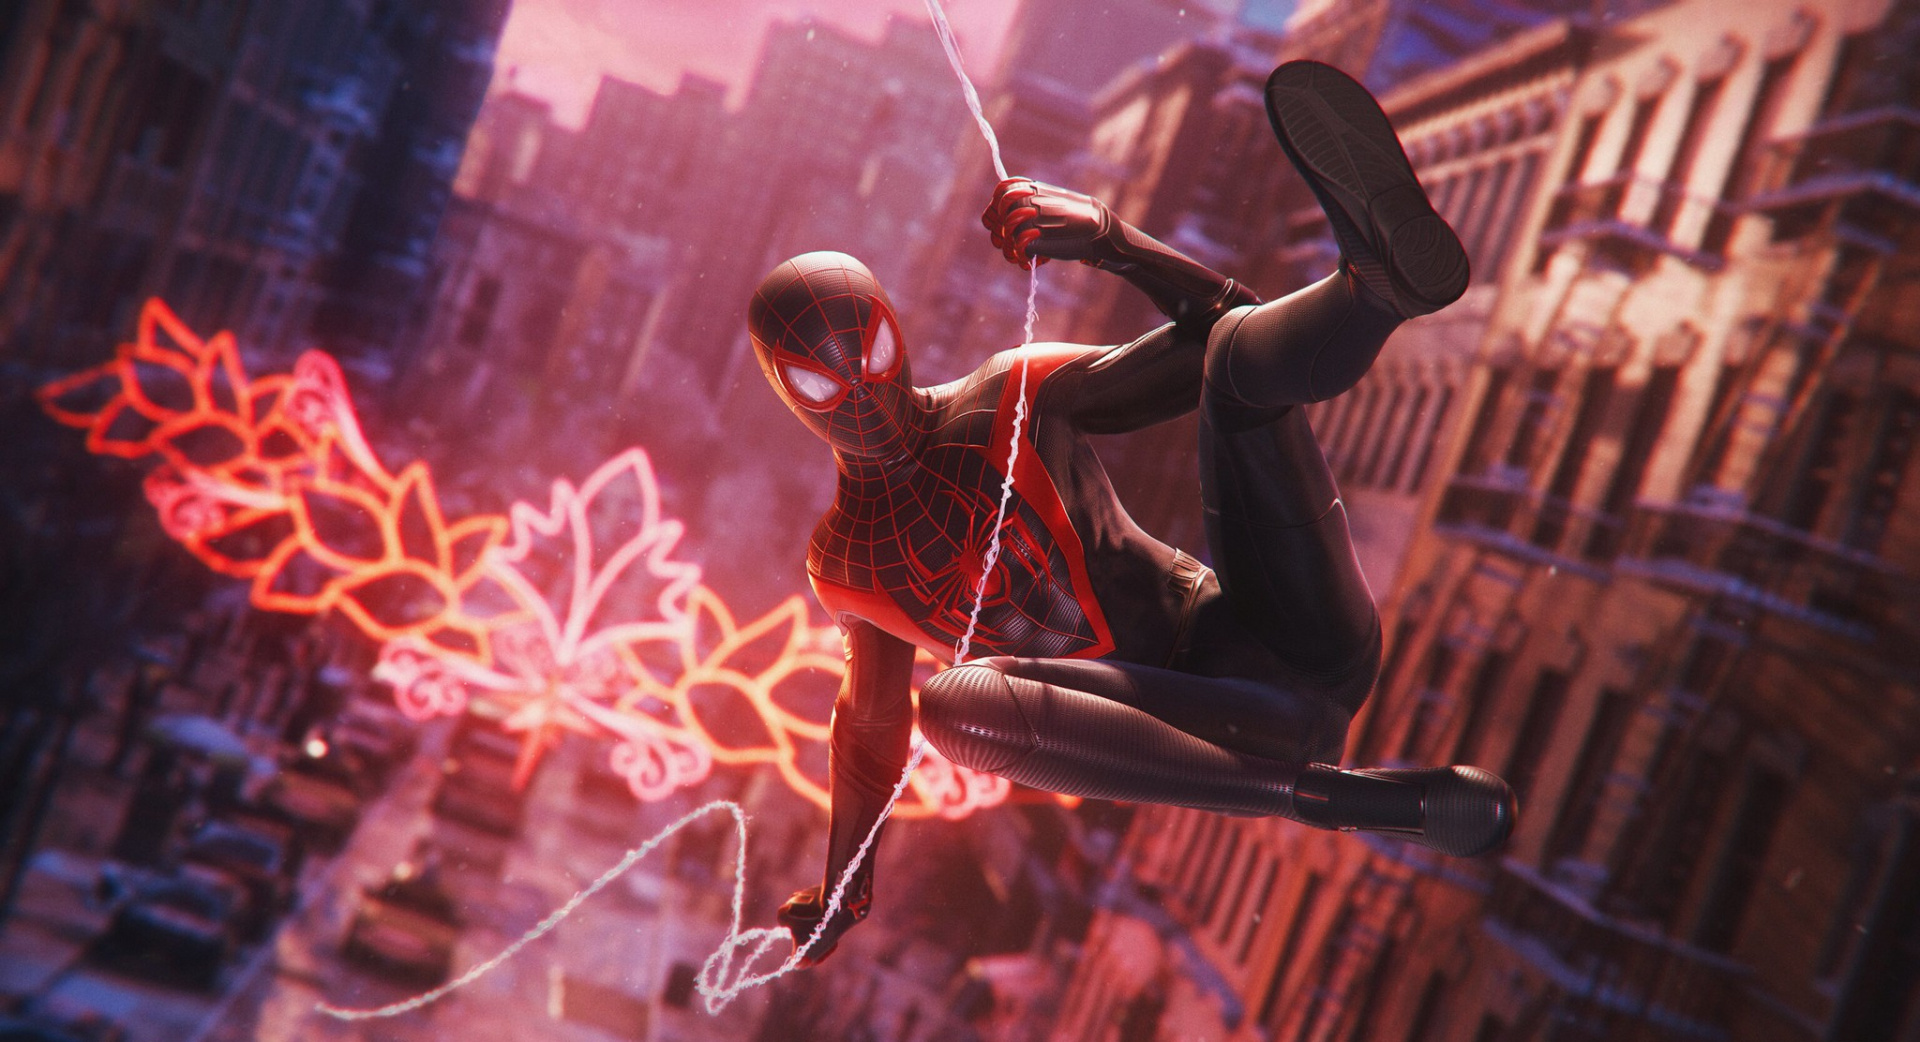 Сохранение «Человека-паука: Майлз Моралес» можно перенести с PS4 на PS5